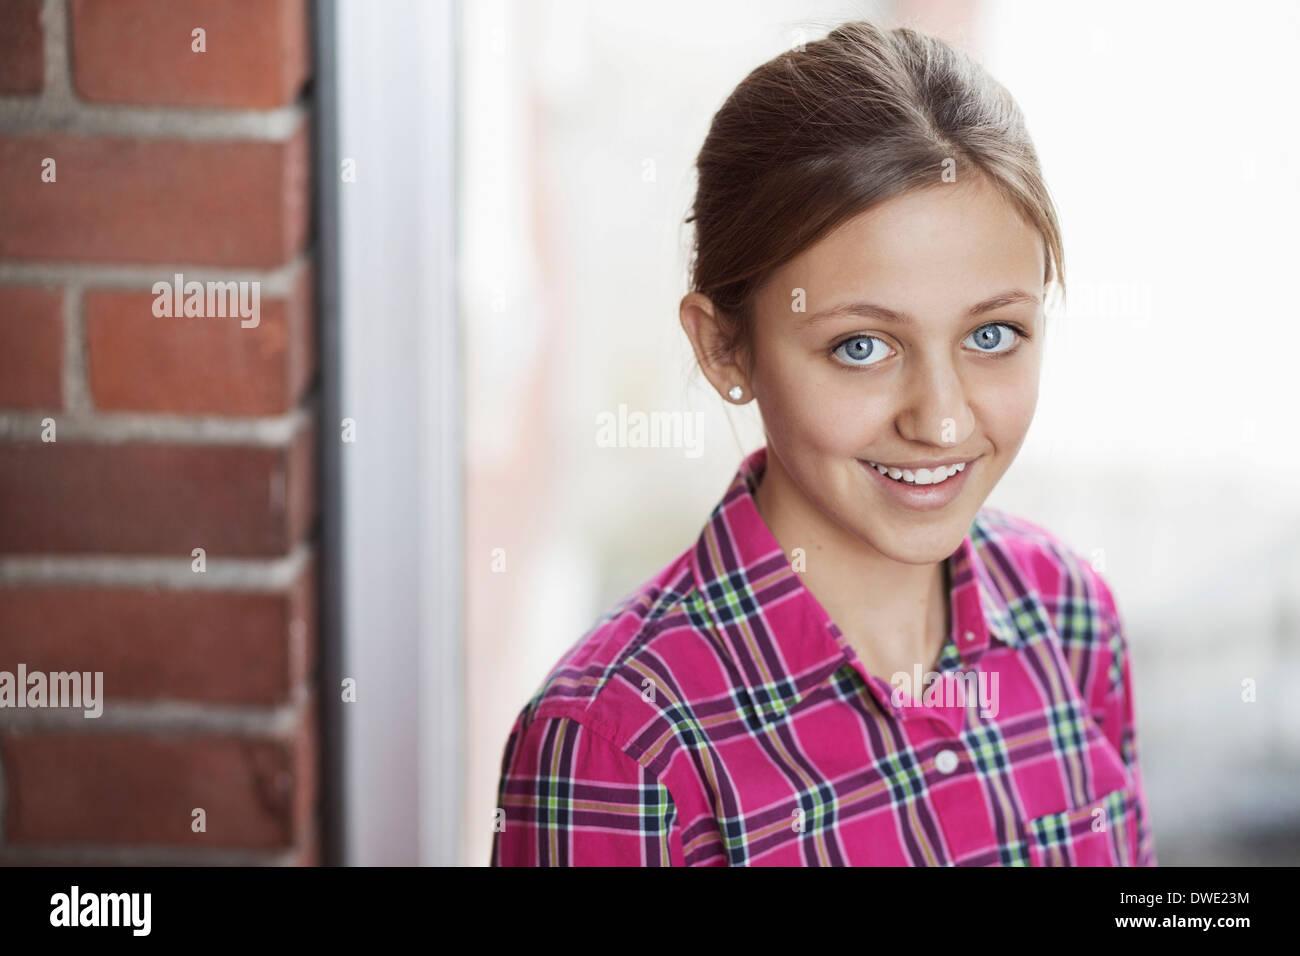 Portrait of happy female student in school - Stock Image